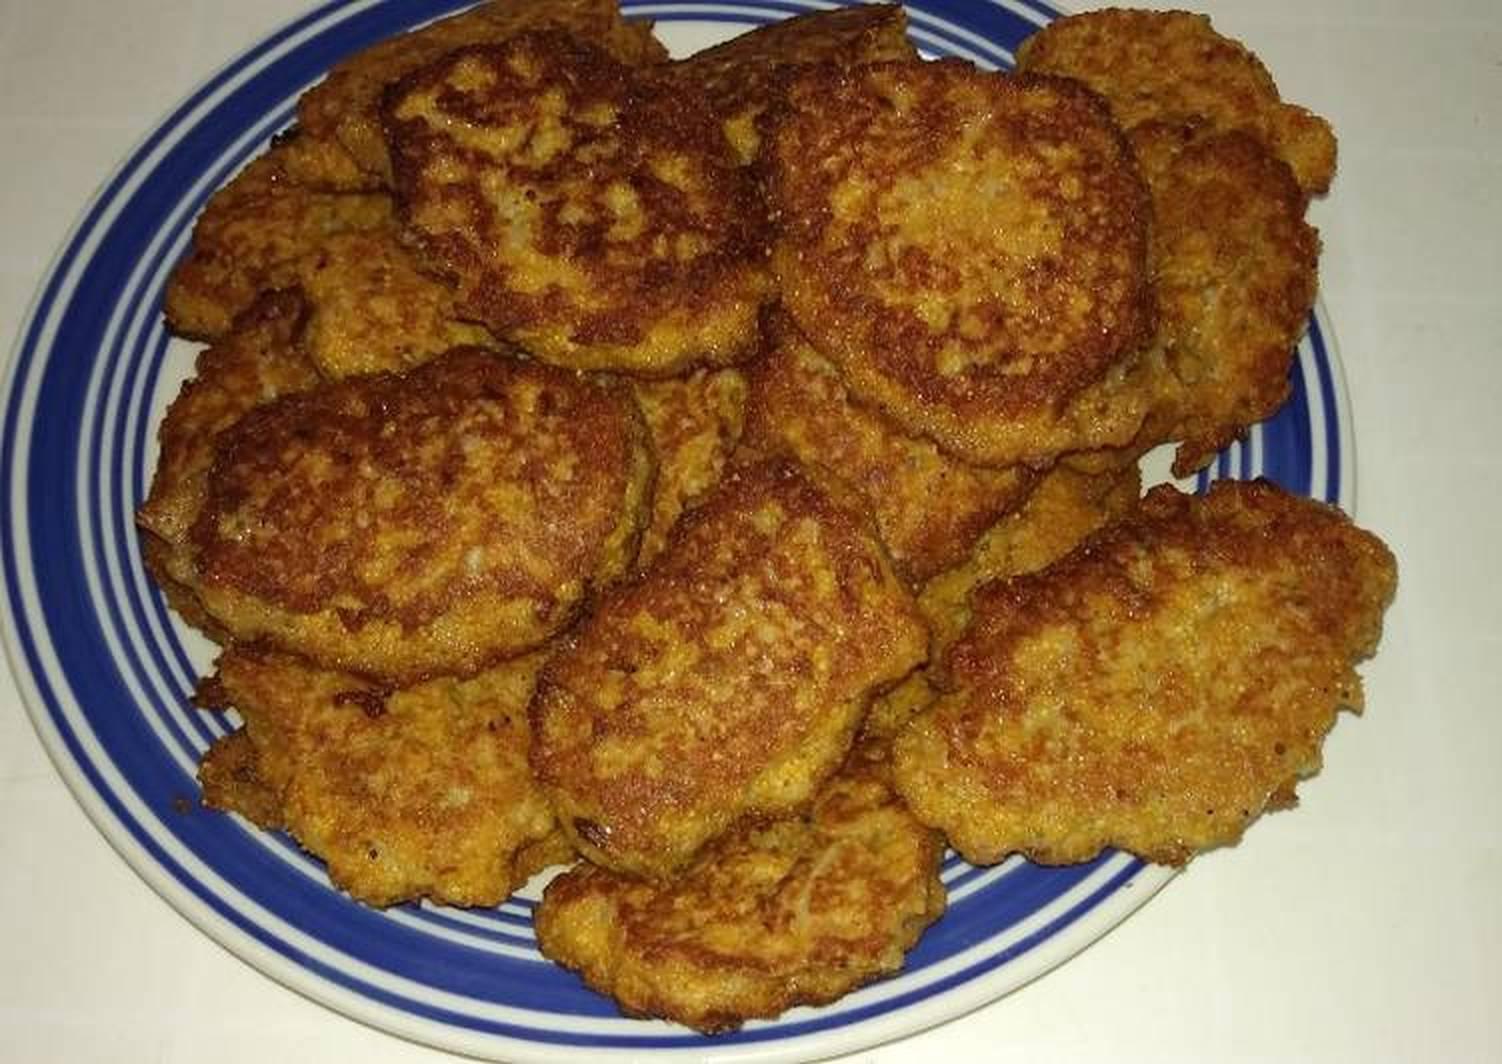 ᐉ котлеты из толстолобика - рыбные рецепты - ✅ ribalka-snasti.ru